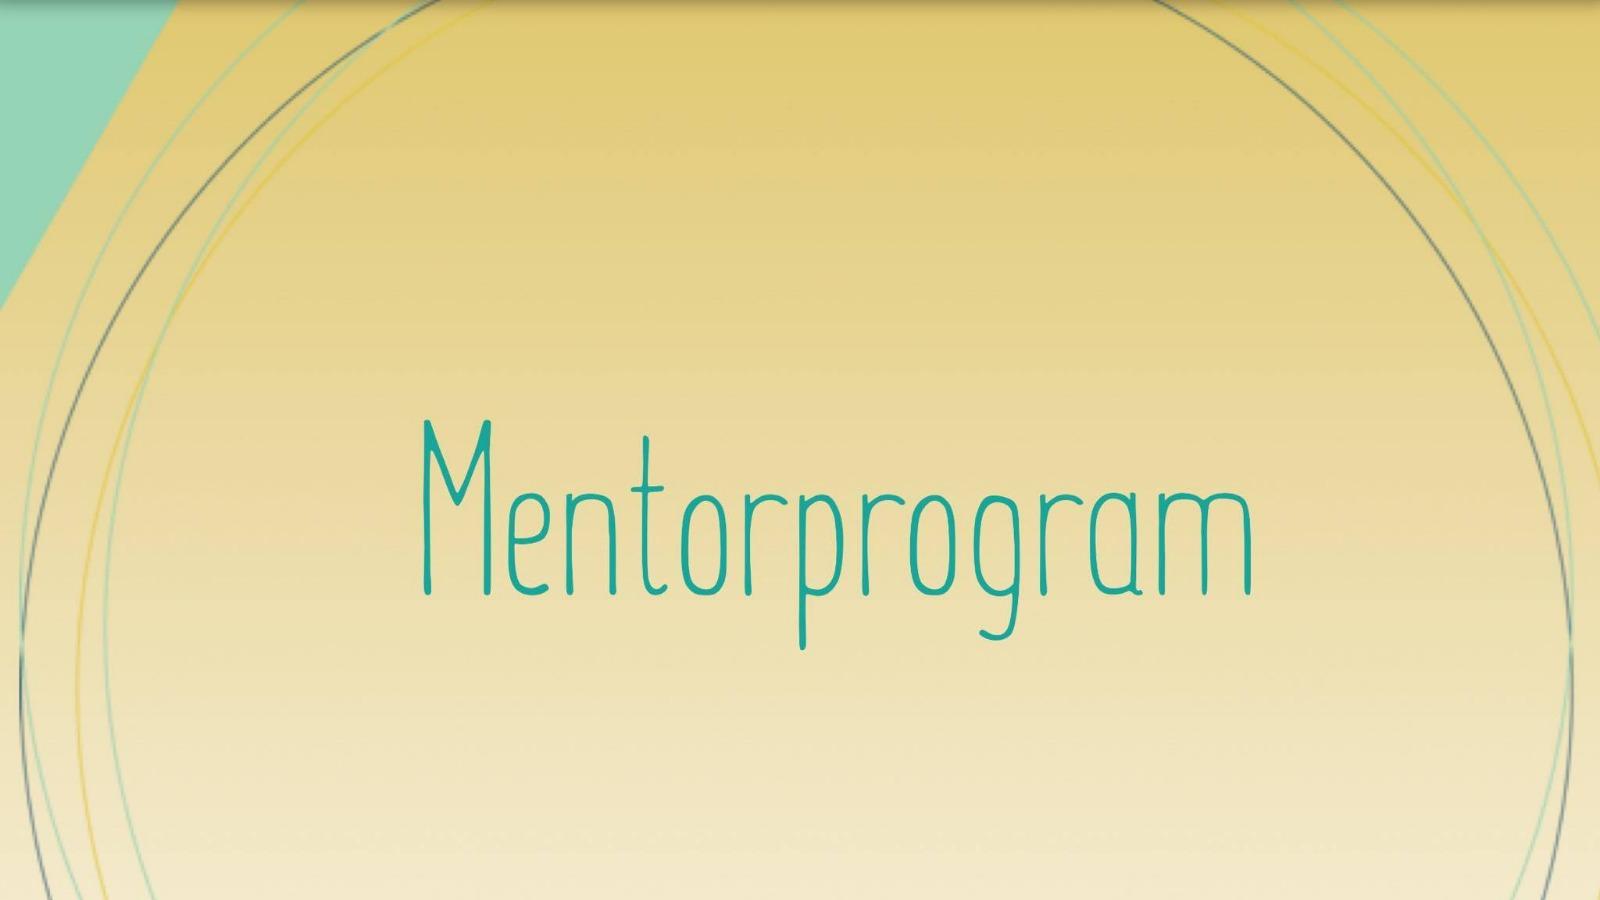 Mentorprogram 4.0